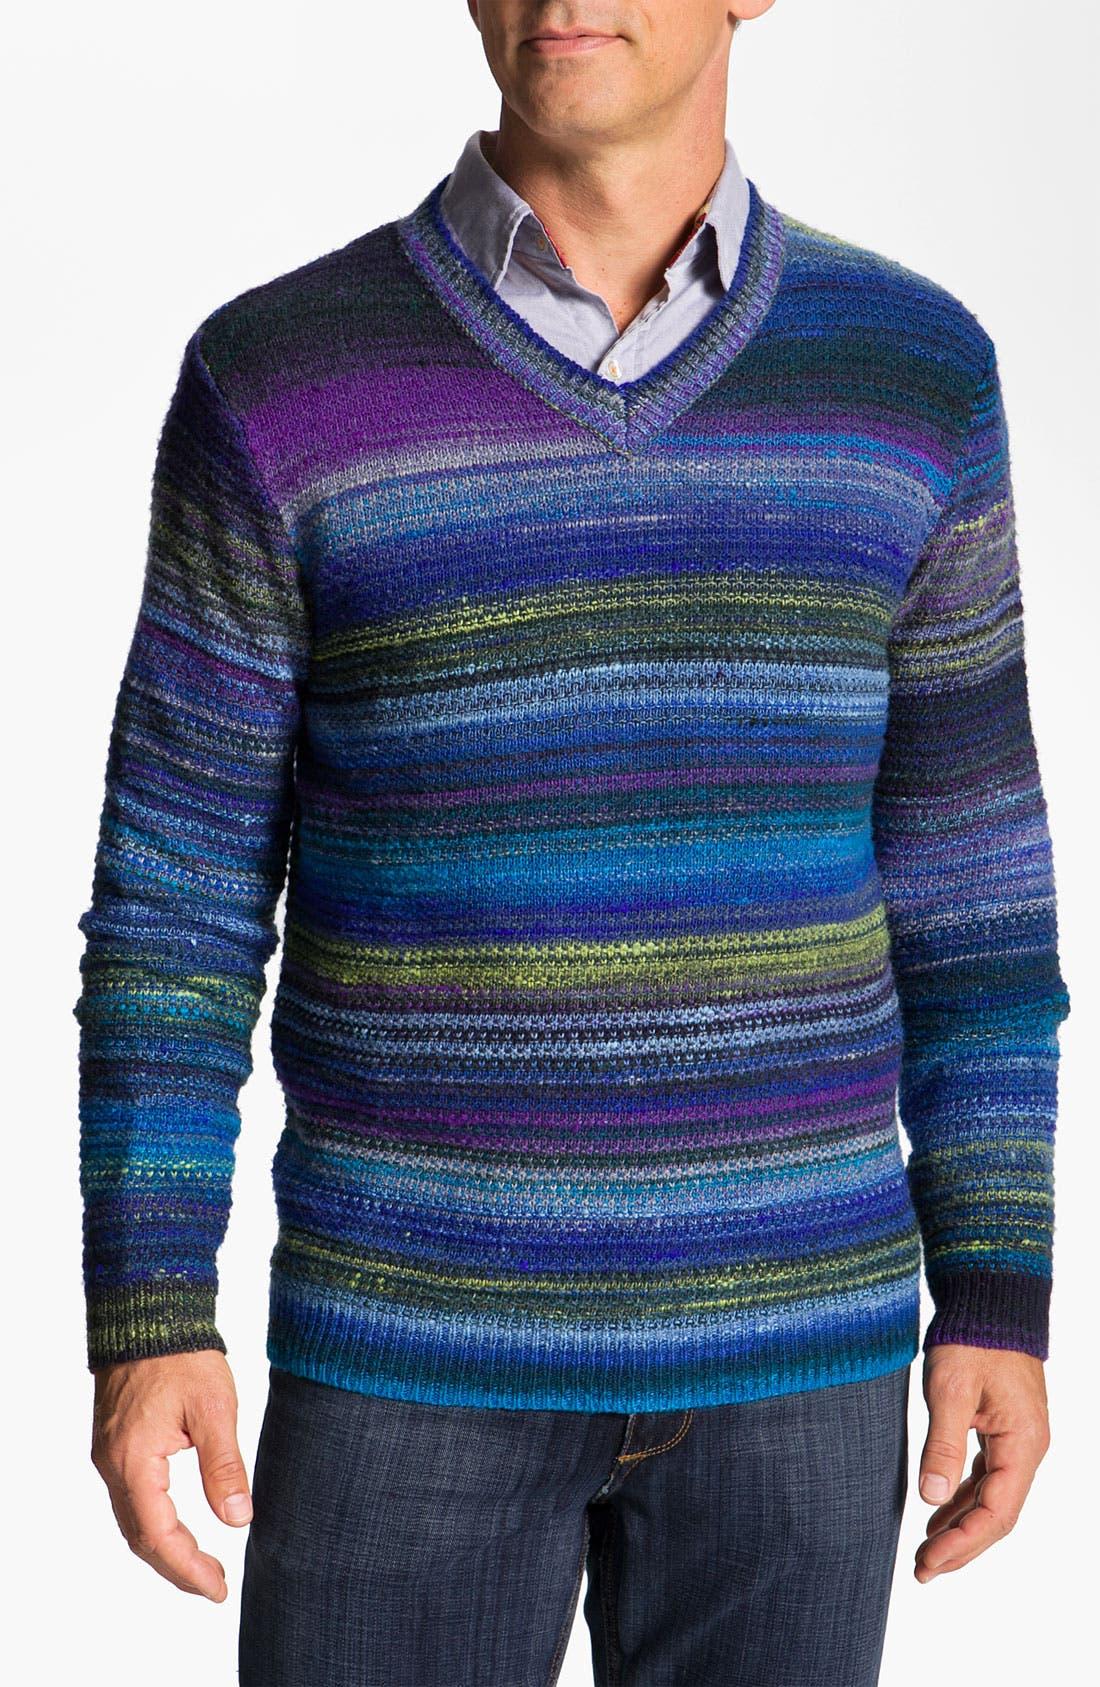 Alternate Image 1 Selected - Robert Graham 'Huntingdon' V-Neck Wool Blend Sweater